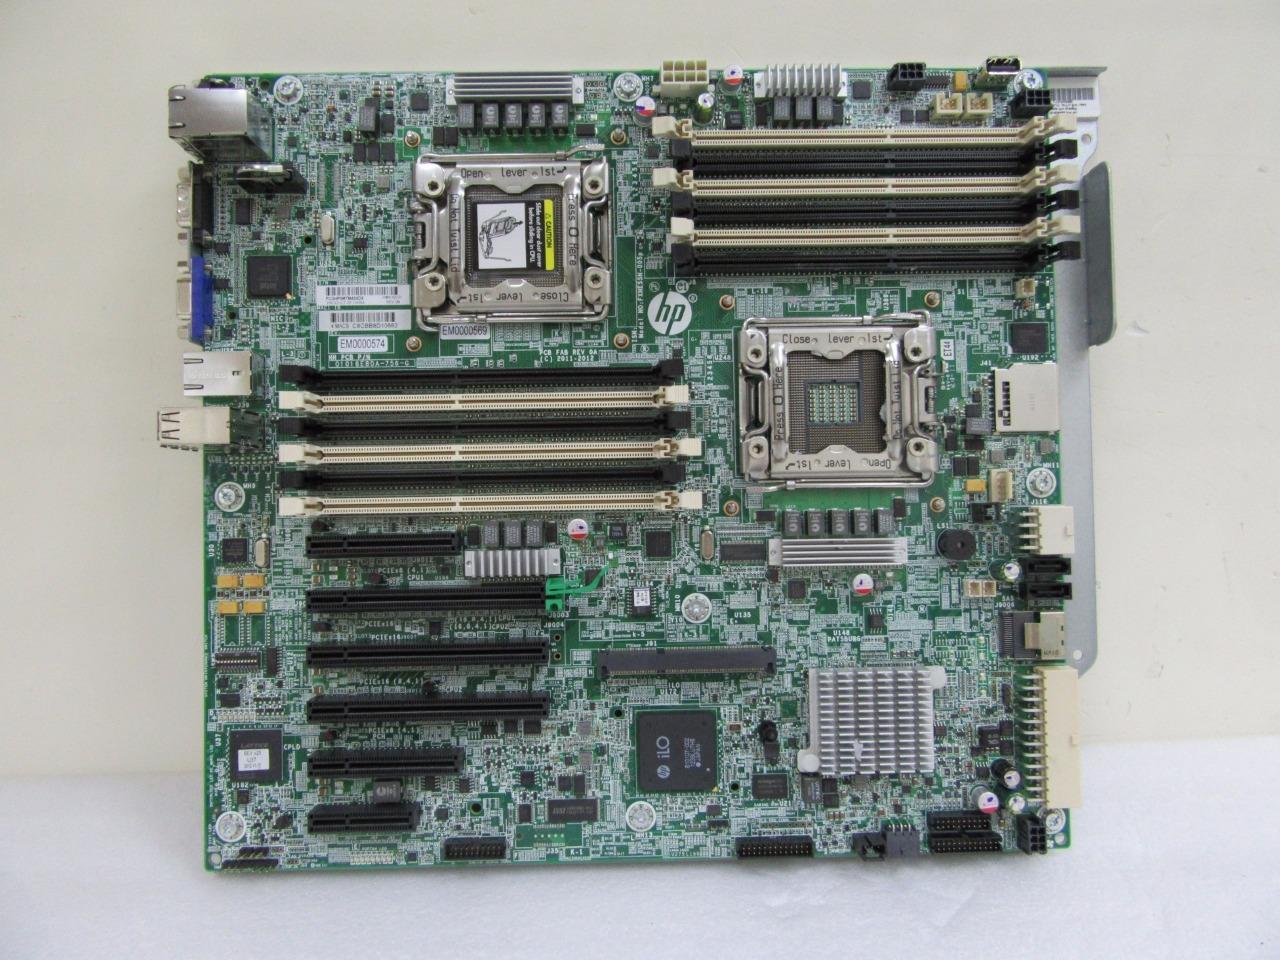 HP SL2500 SL210t Gen8 System Board 735972-001 Half-With SL2500 Motherboard